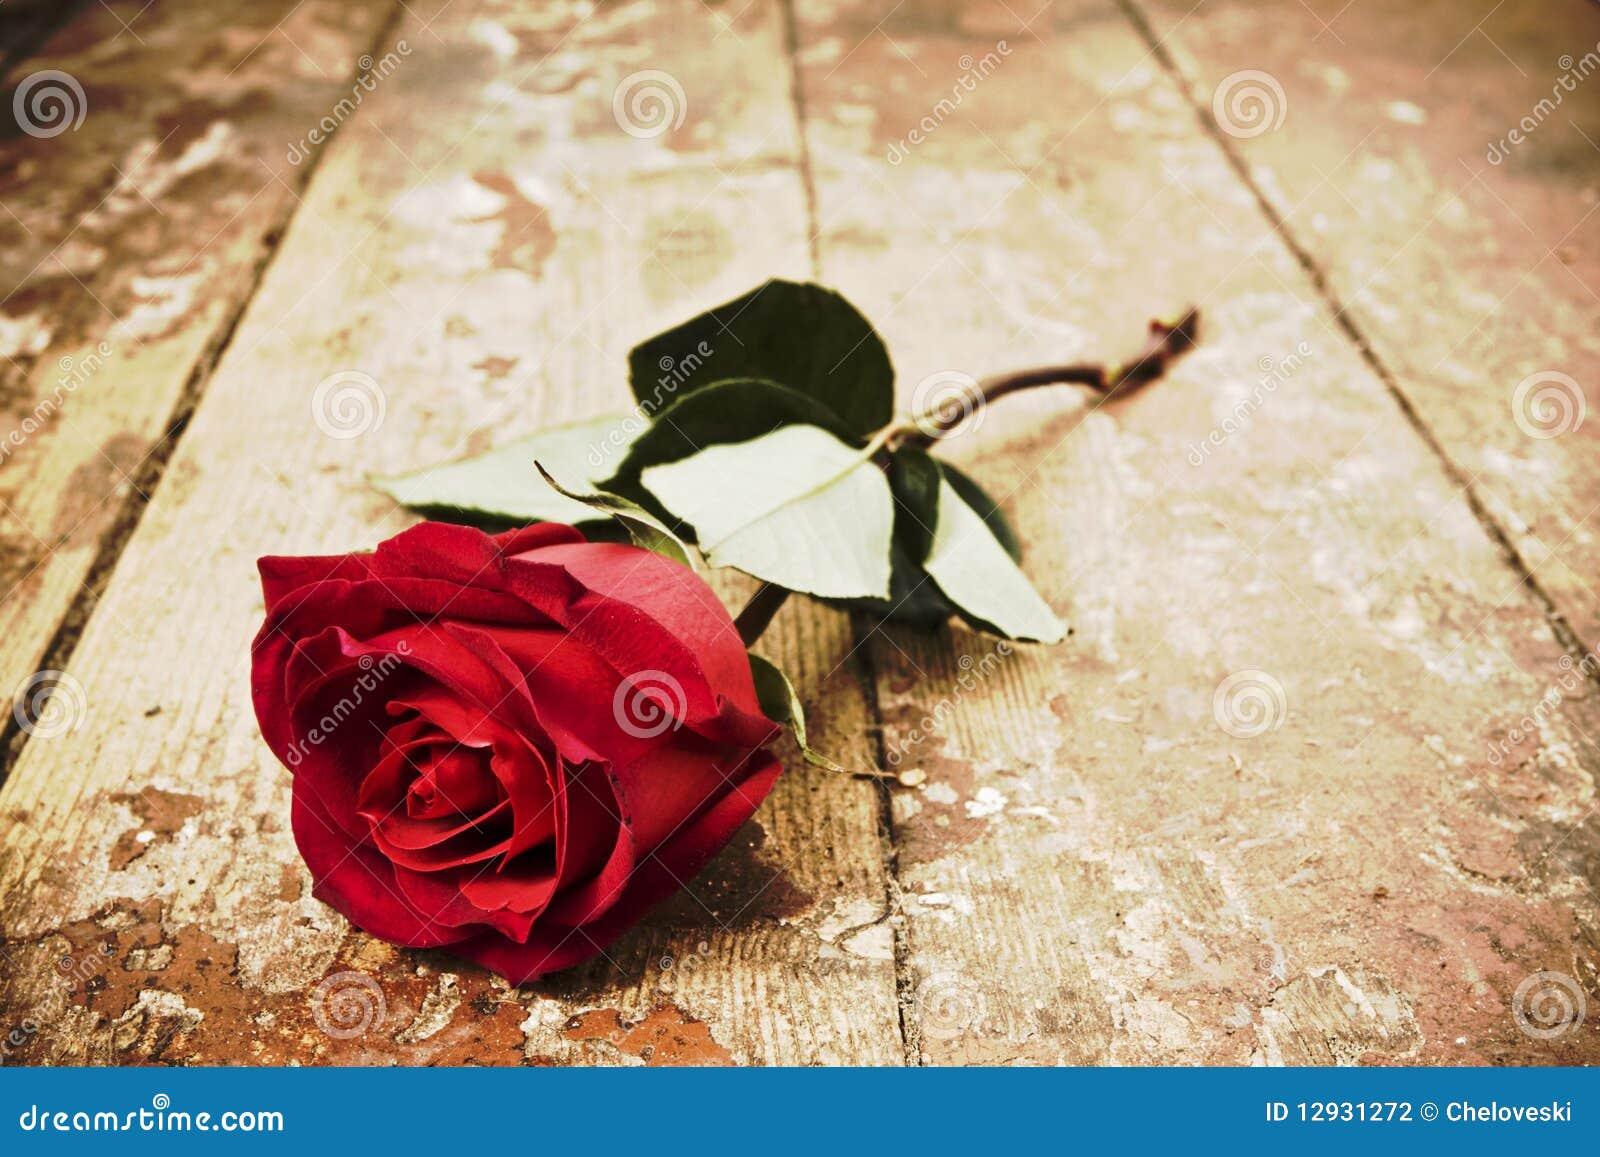 red rose stock photography image 12931272. Black Bedroom Furniture Sets. Home Design Ideas